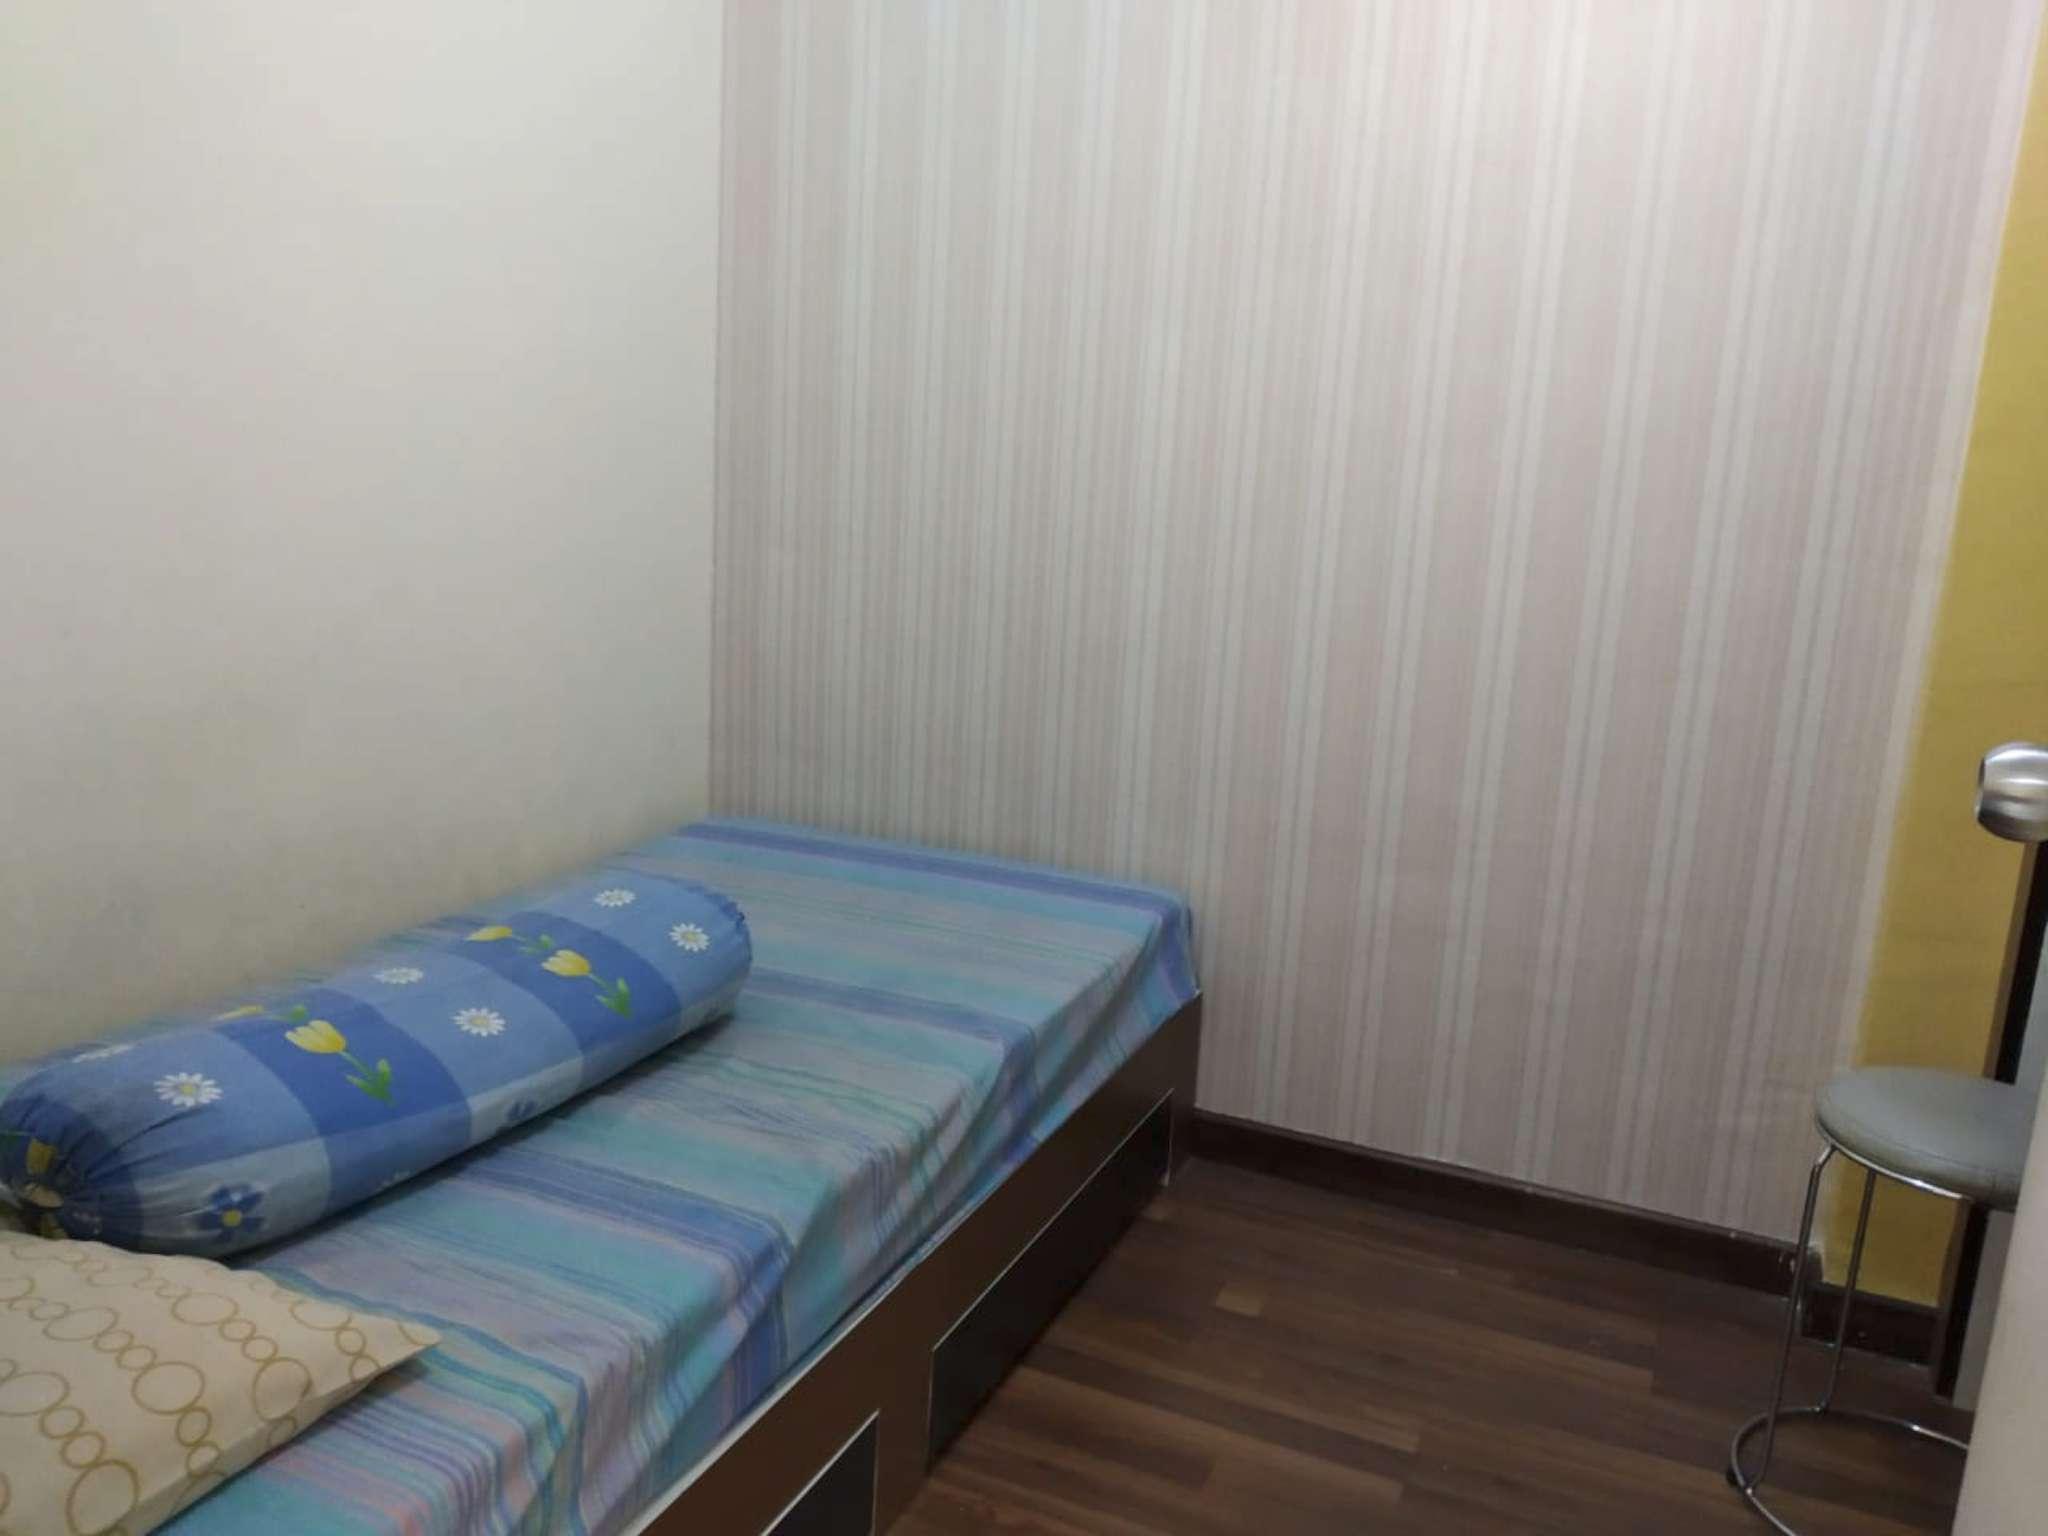 2BR Apartment Gading Nias   Pelita Property 2